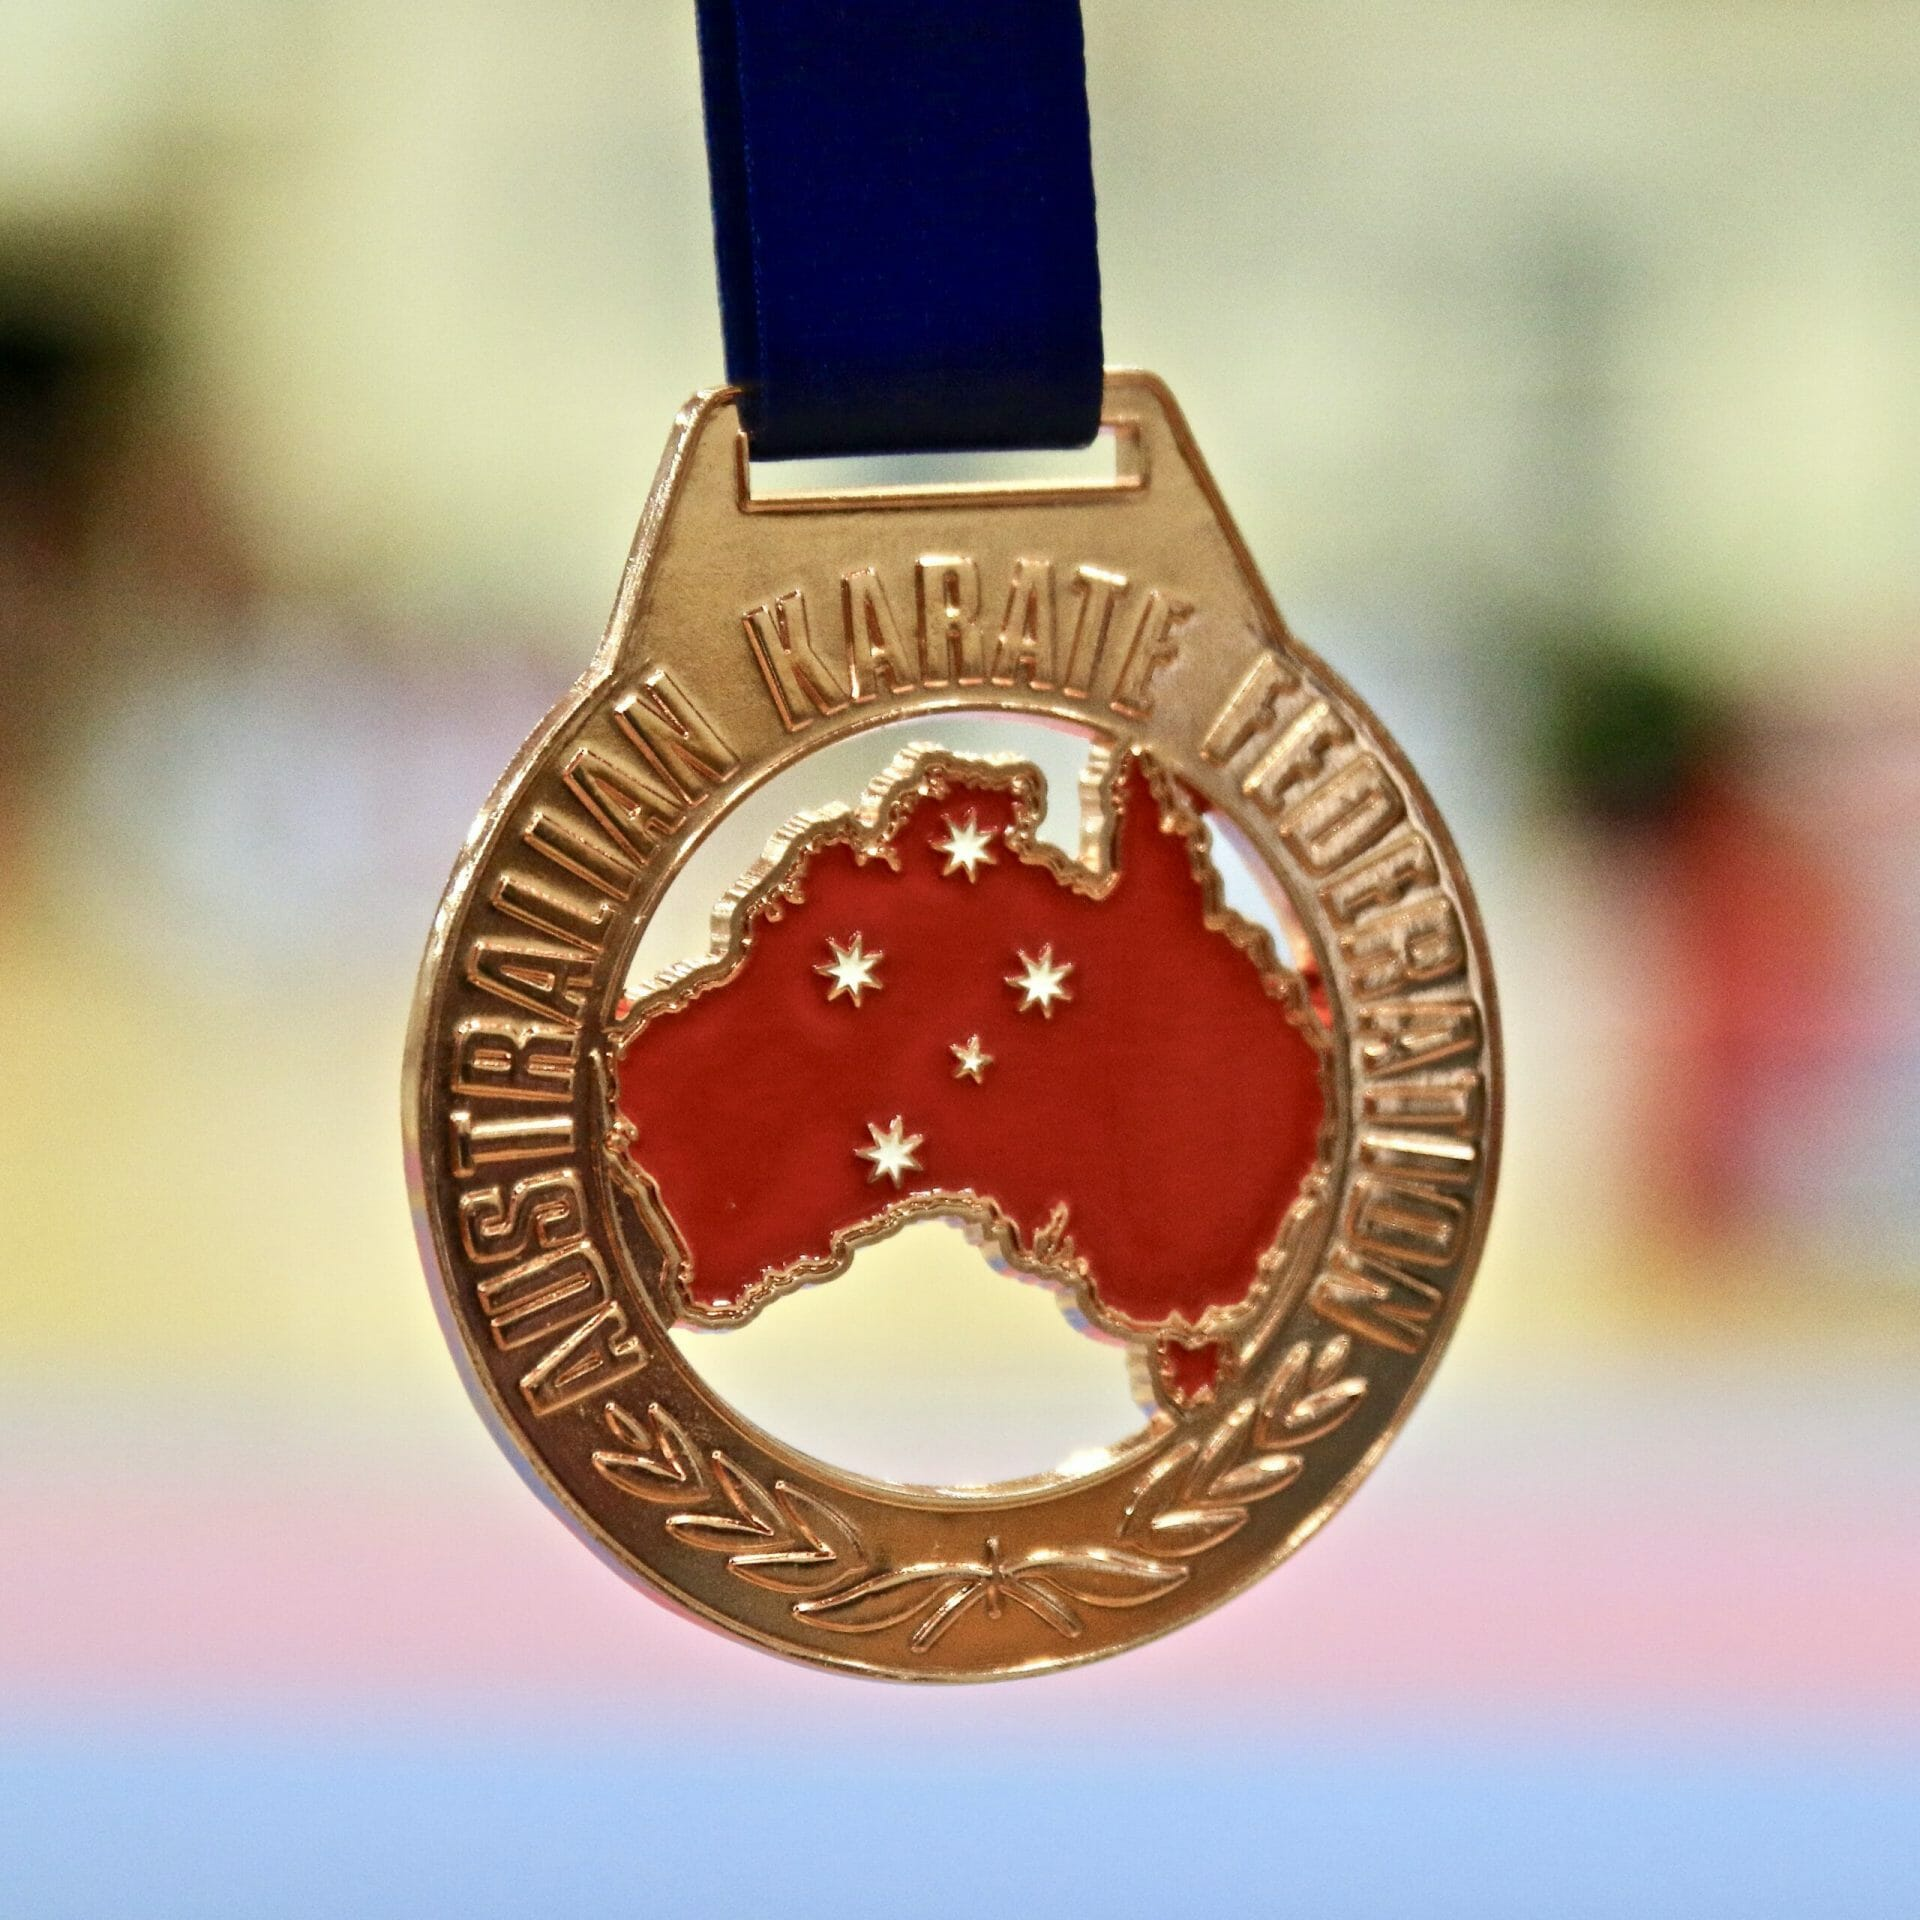 Australian Karate Federation member